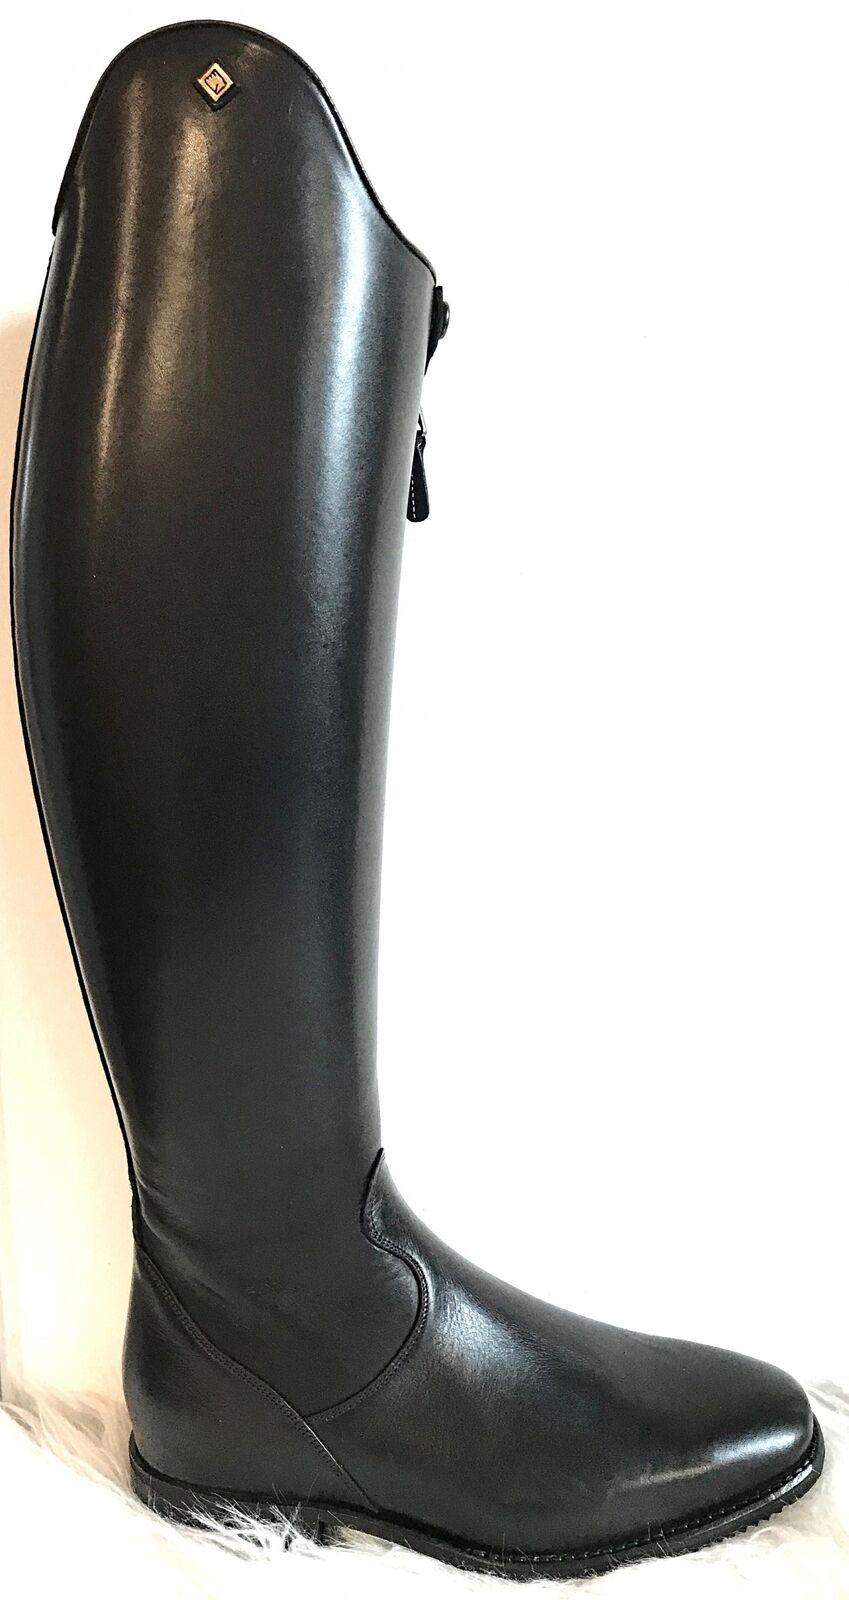 Deniro reitbotas Tiziano negro 42 mc l dressurbotas